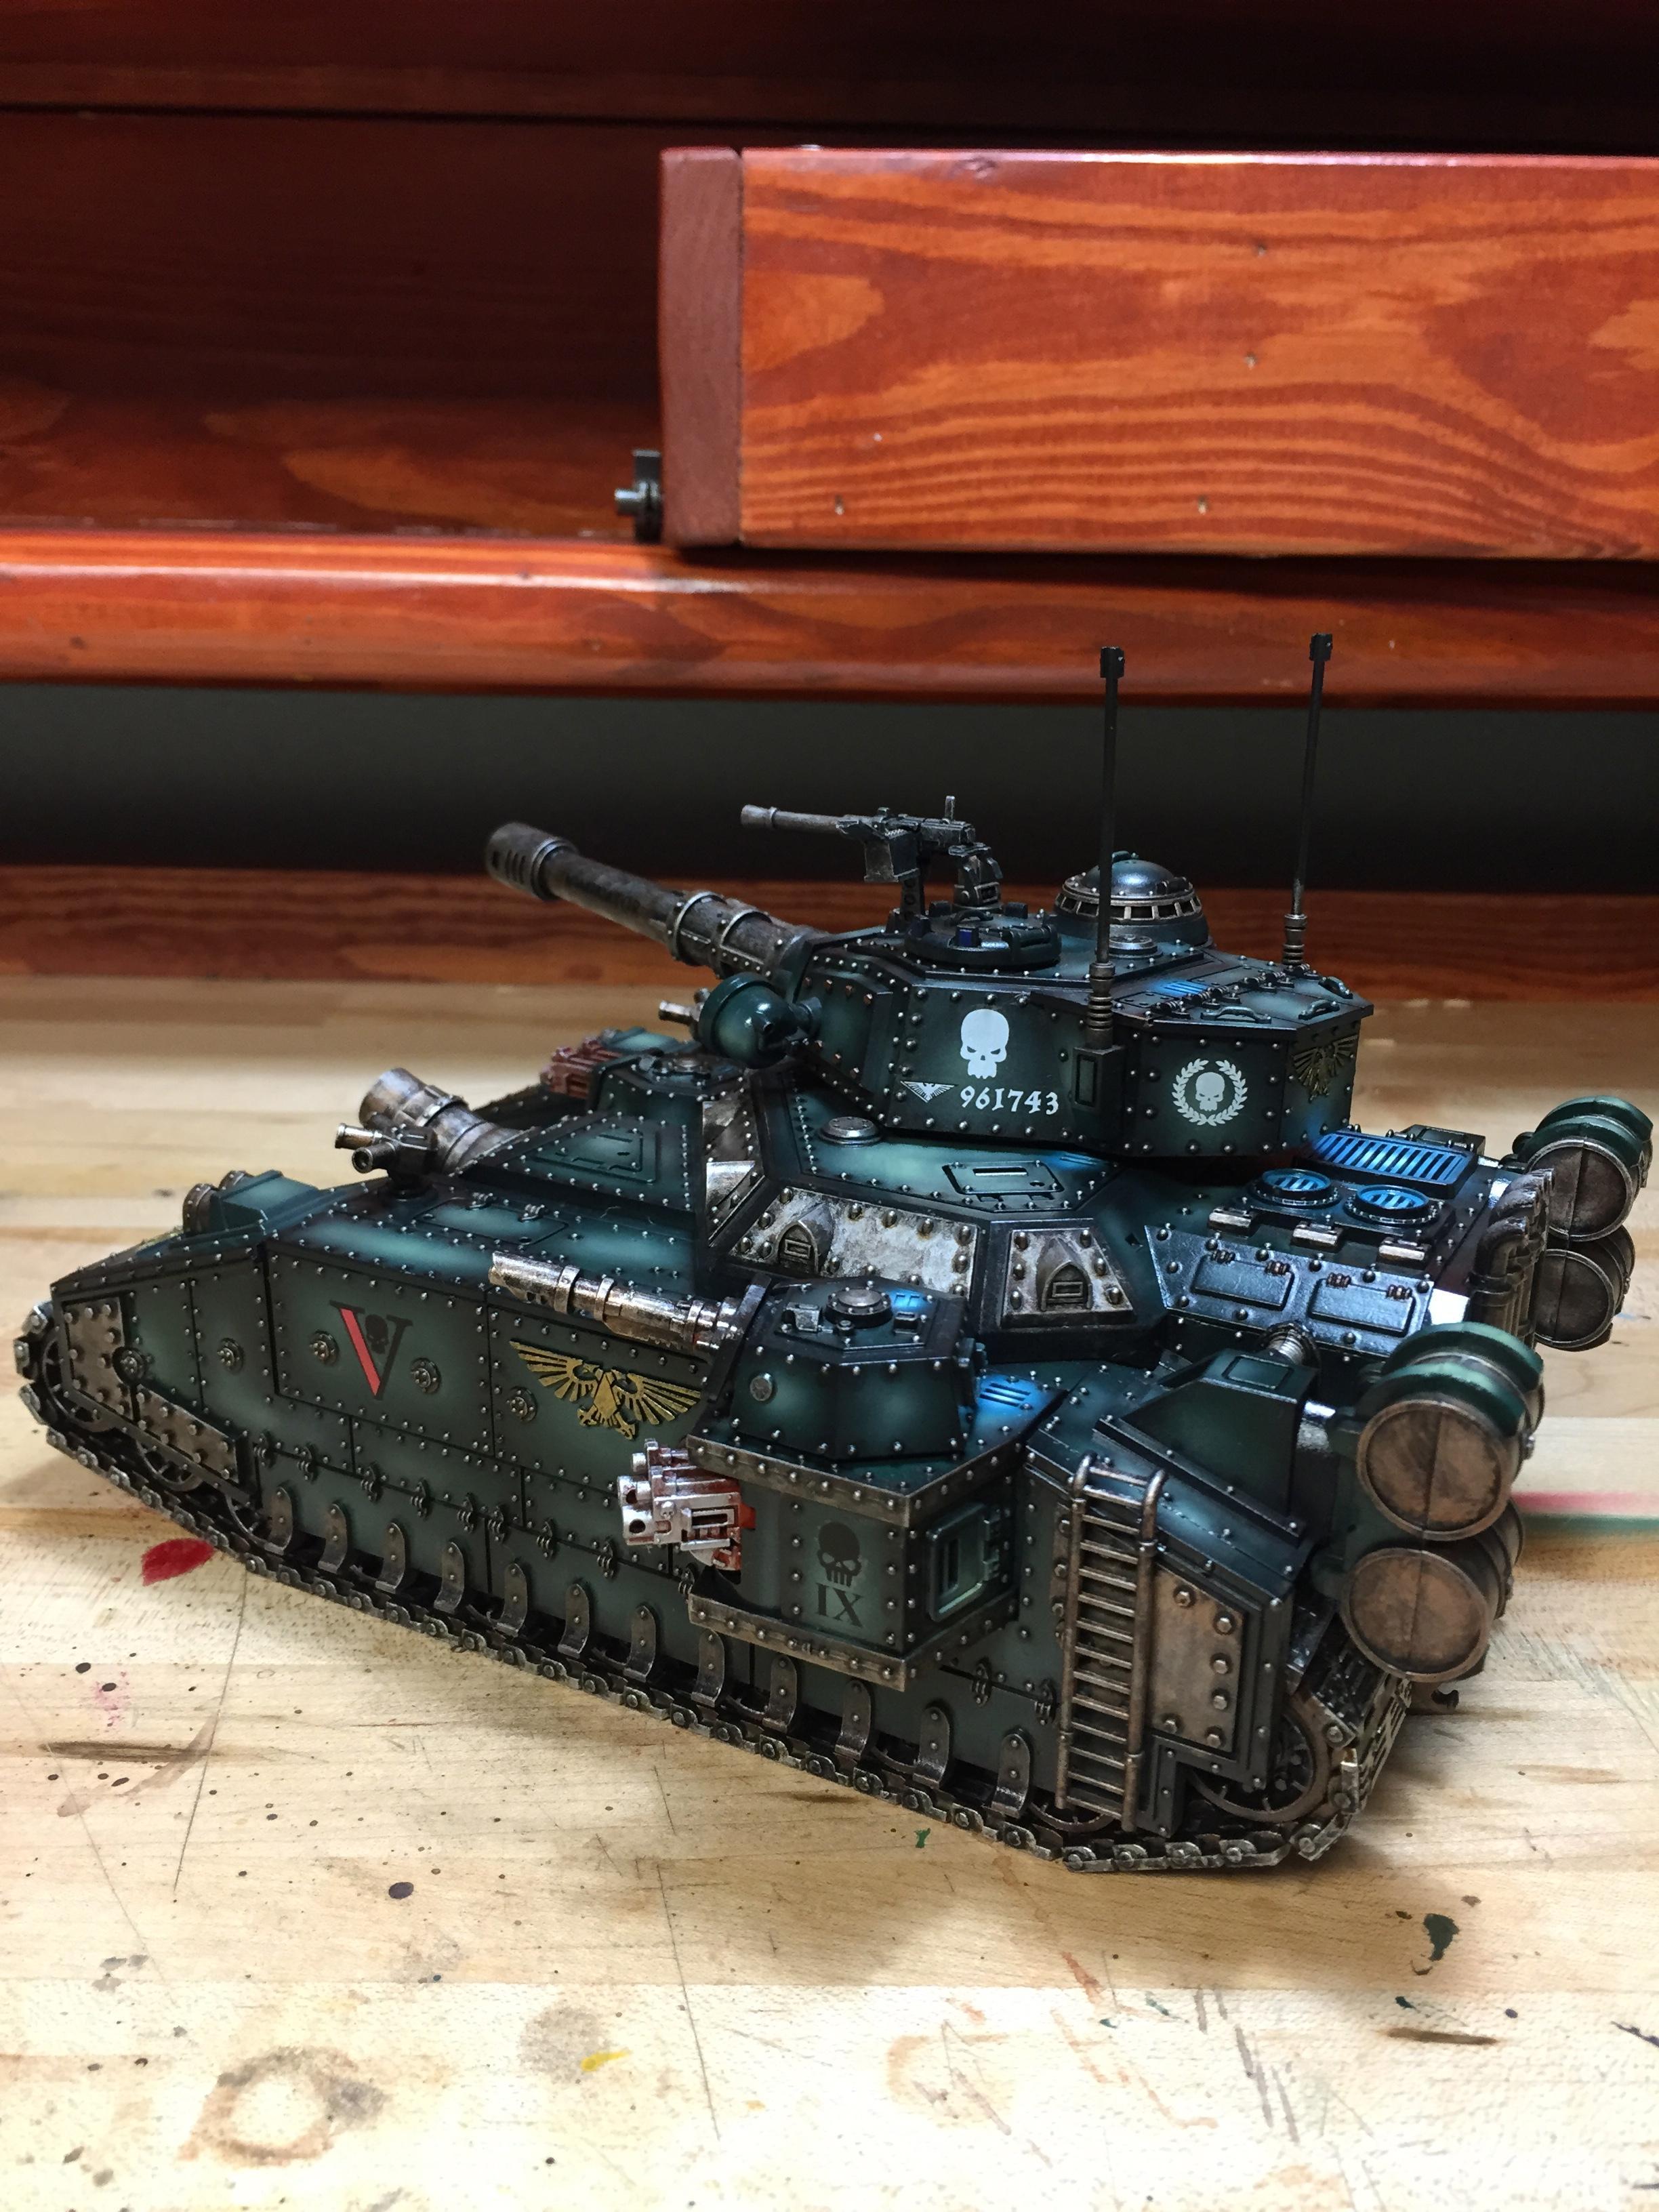 Am, Astra Militarum, Baneblade, Imperial Guard, Tank, Warhammer Fantasy